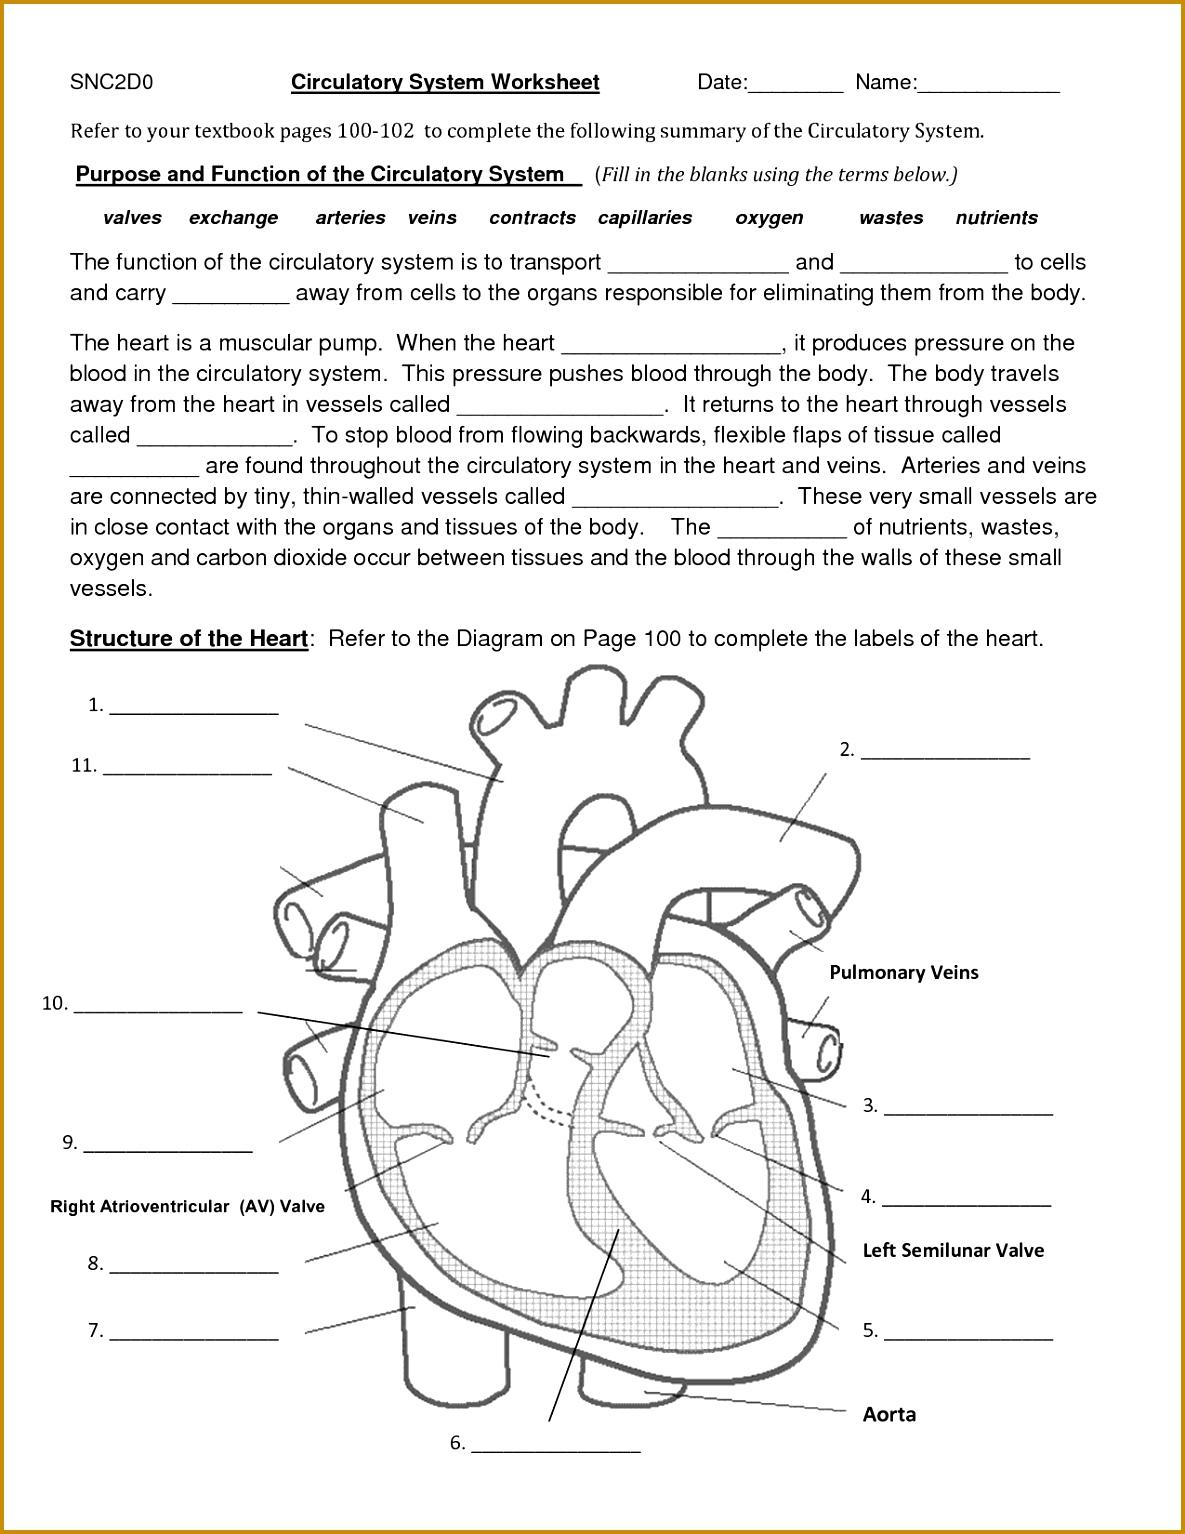 4 Circulatory System Worksheet